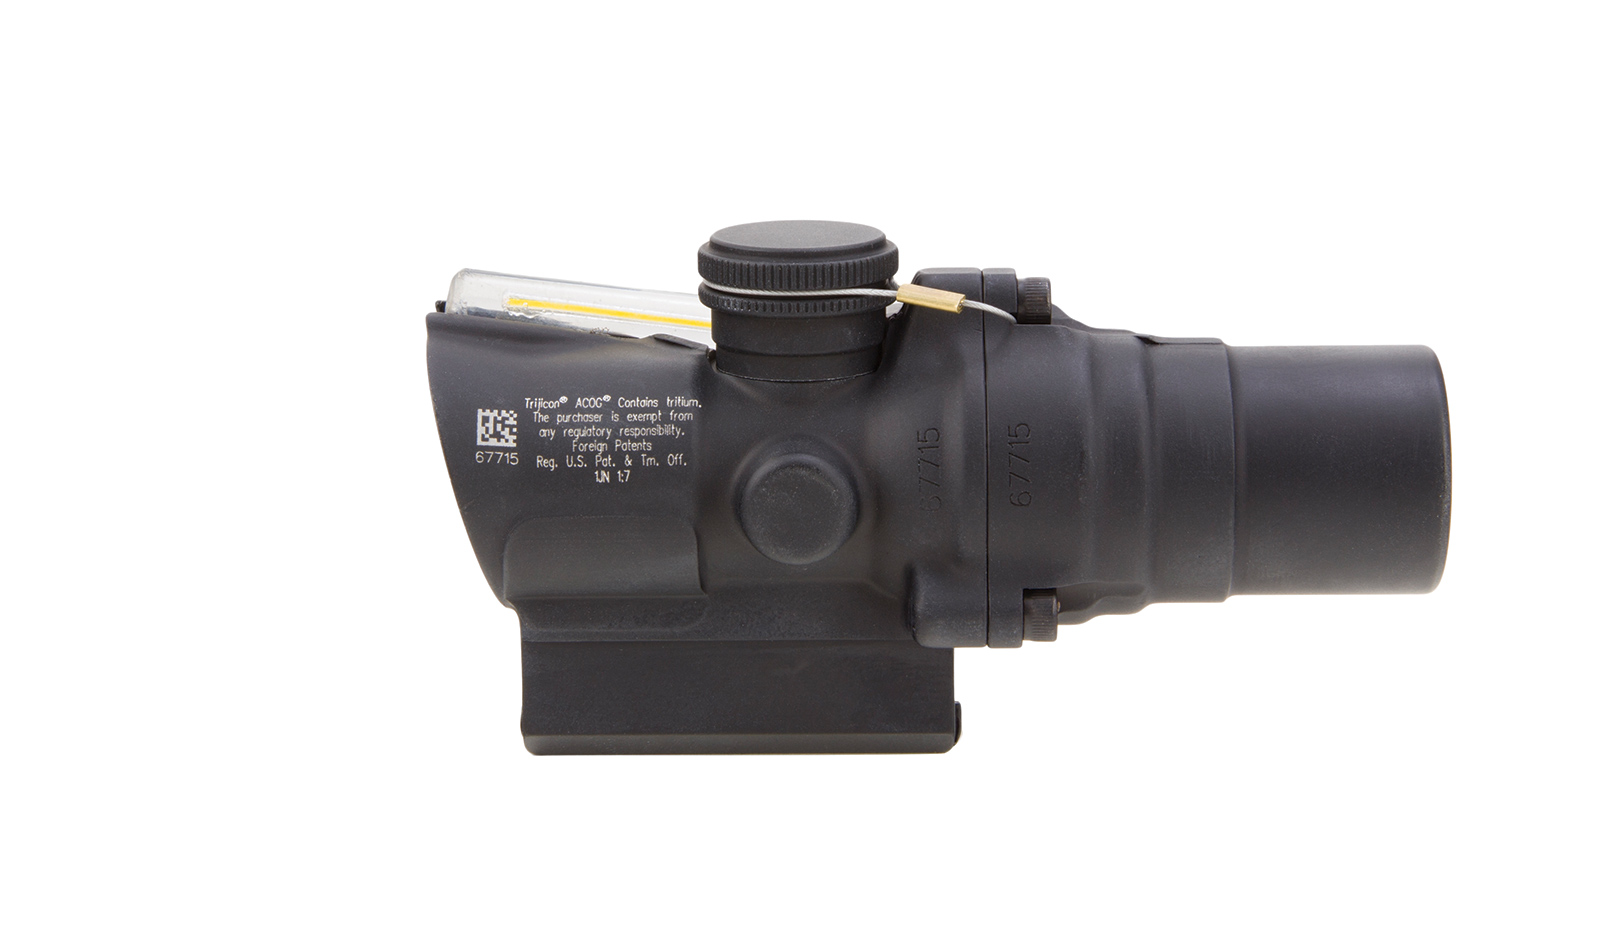 TA44-C-400138 angle 2